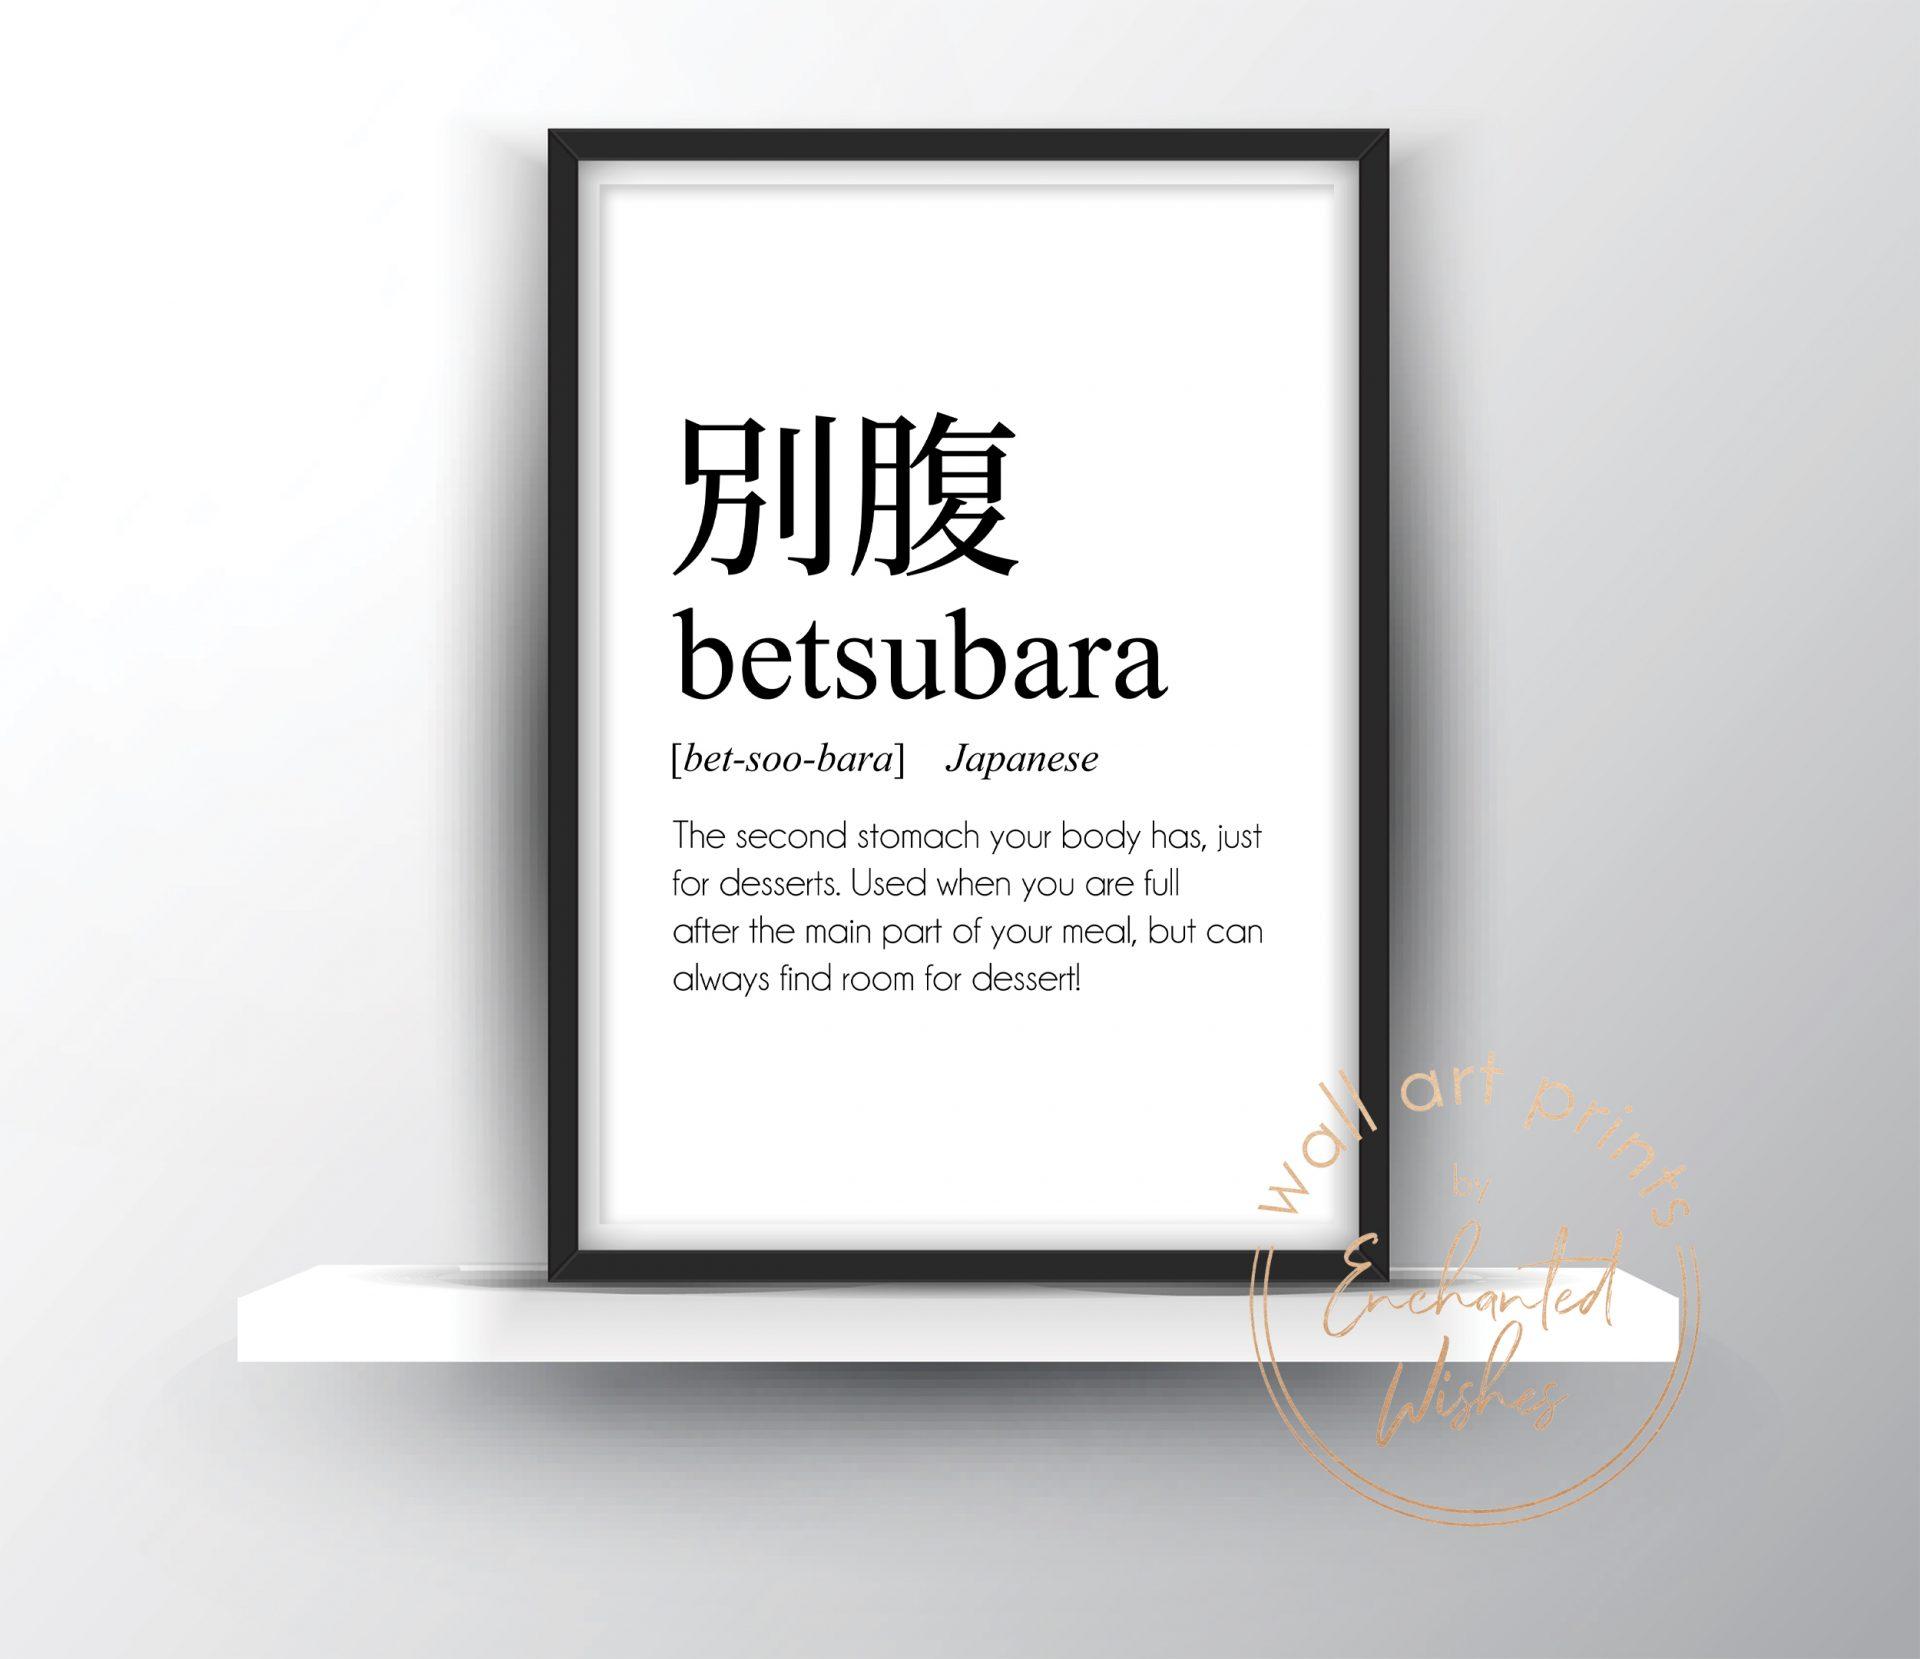 Betsubara definition print